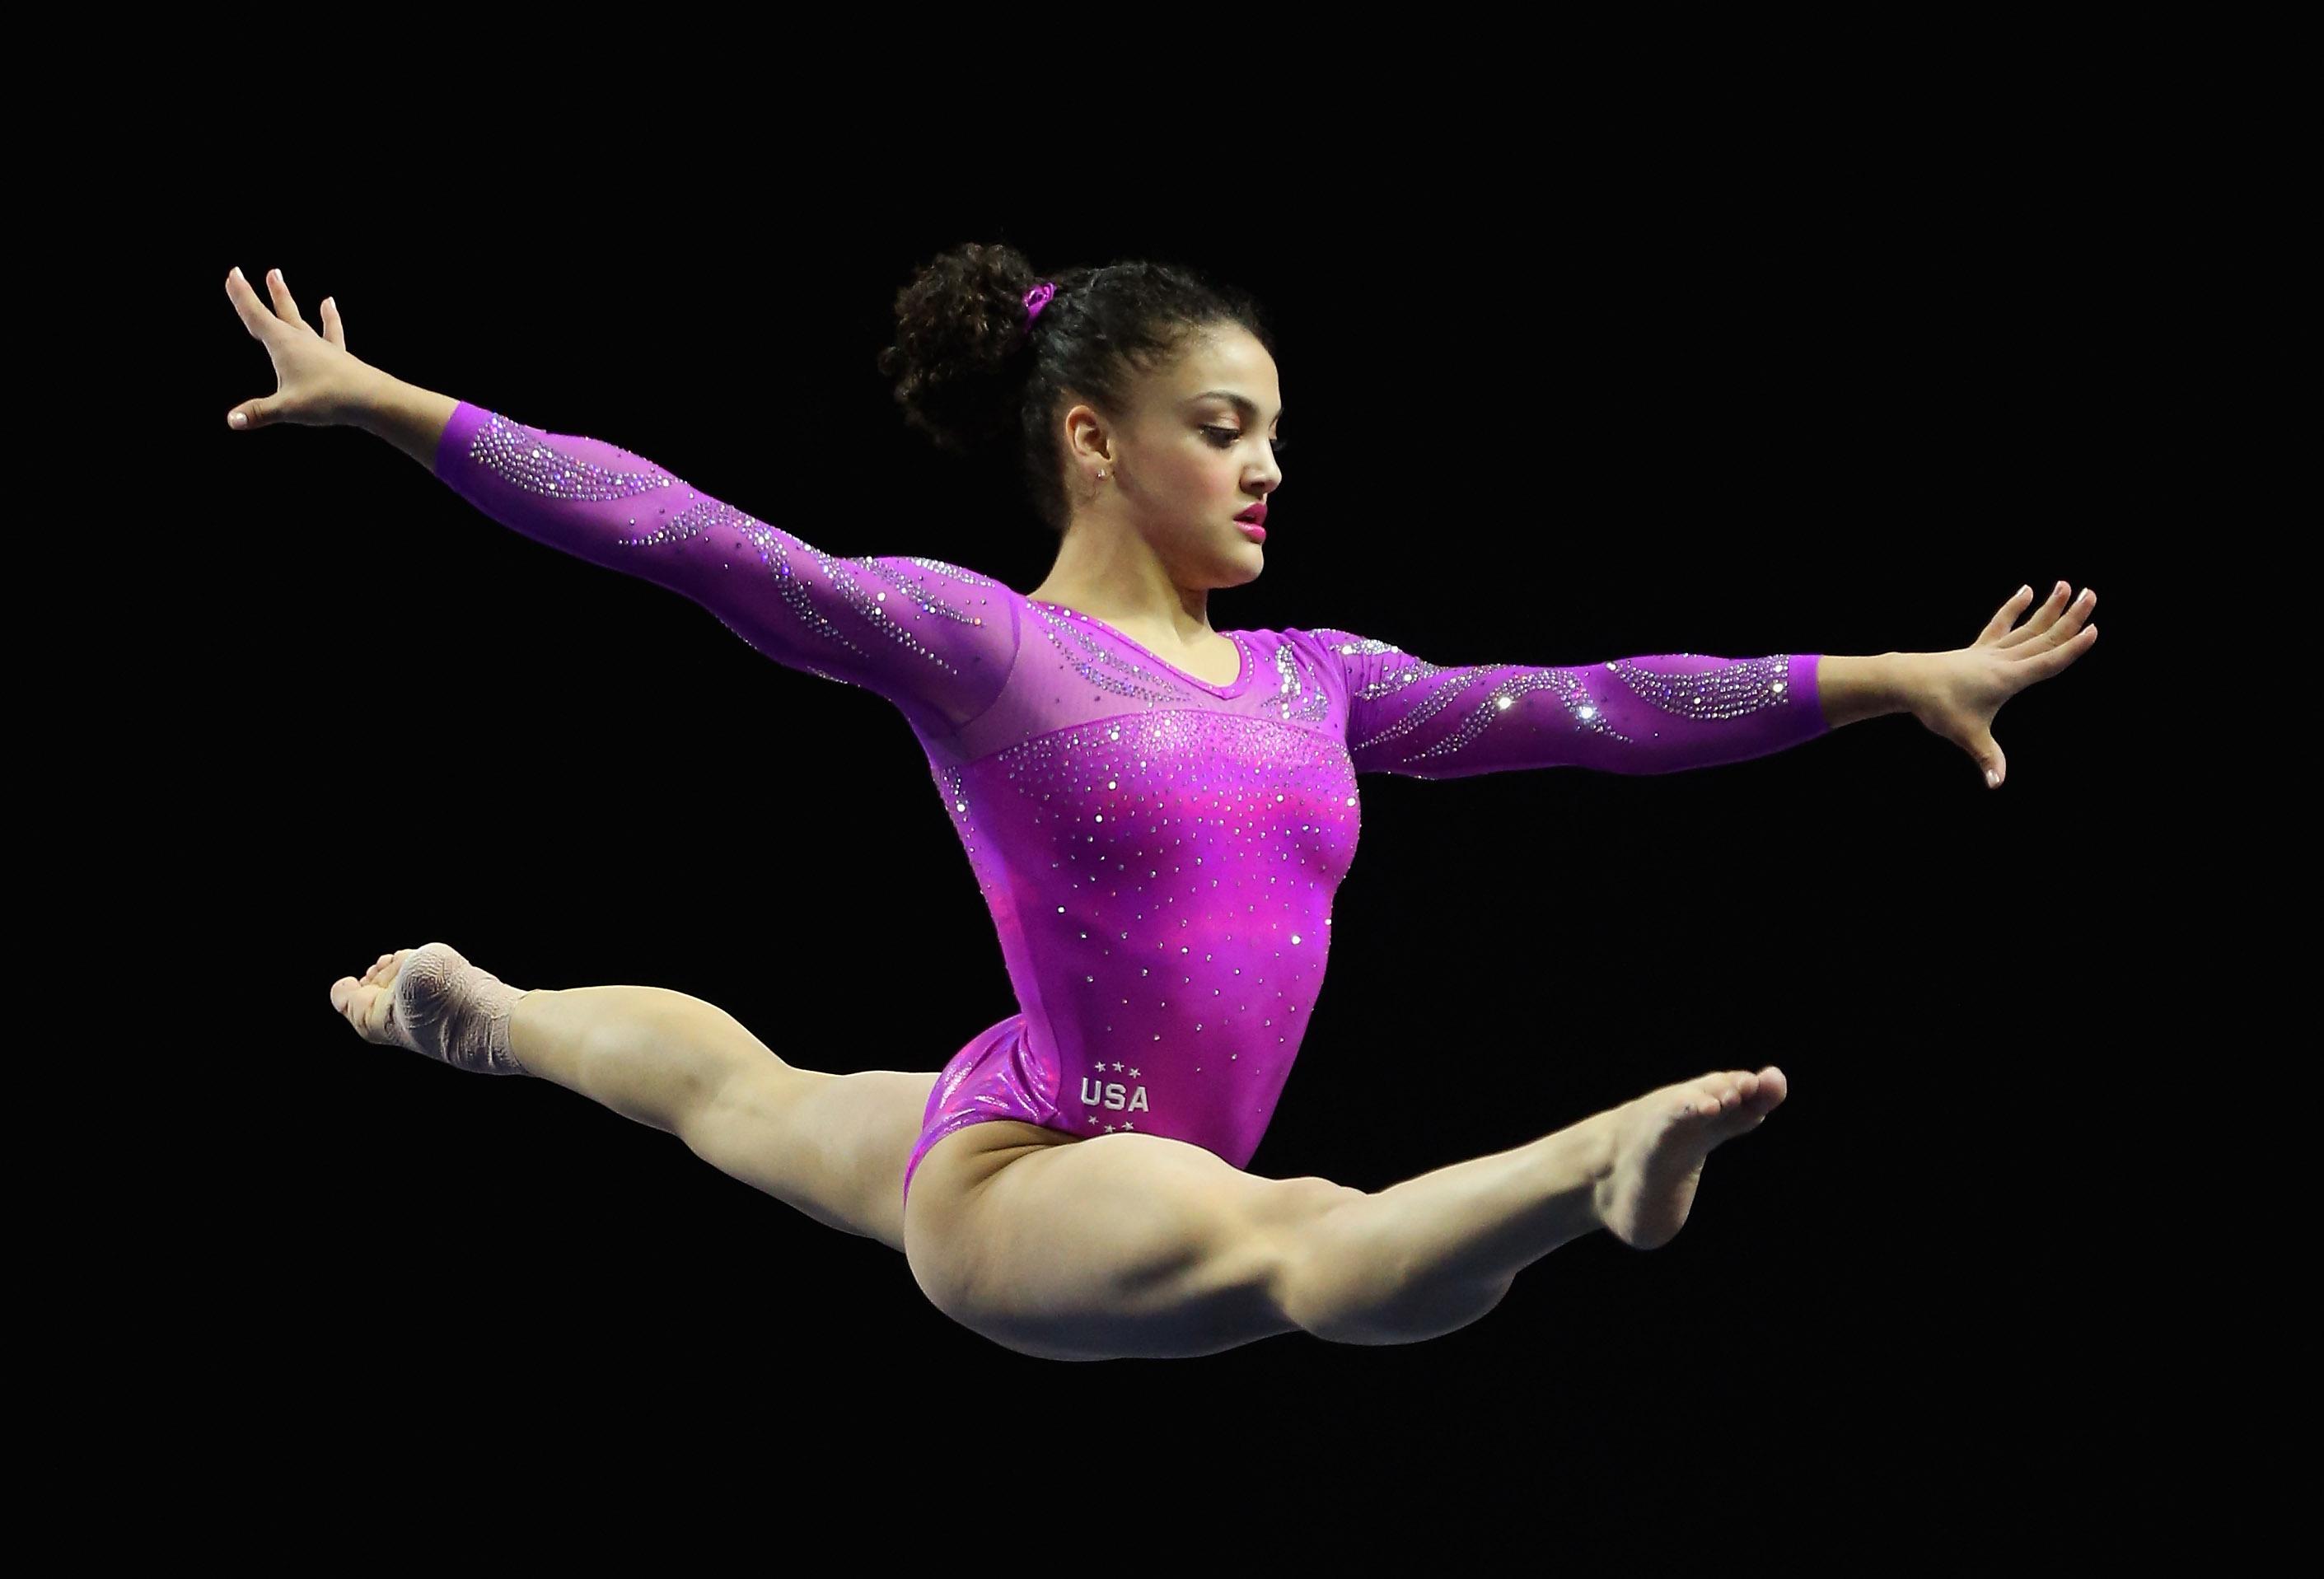 Laurie Hernandez cuban